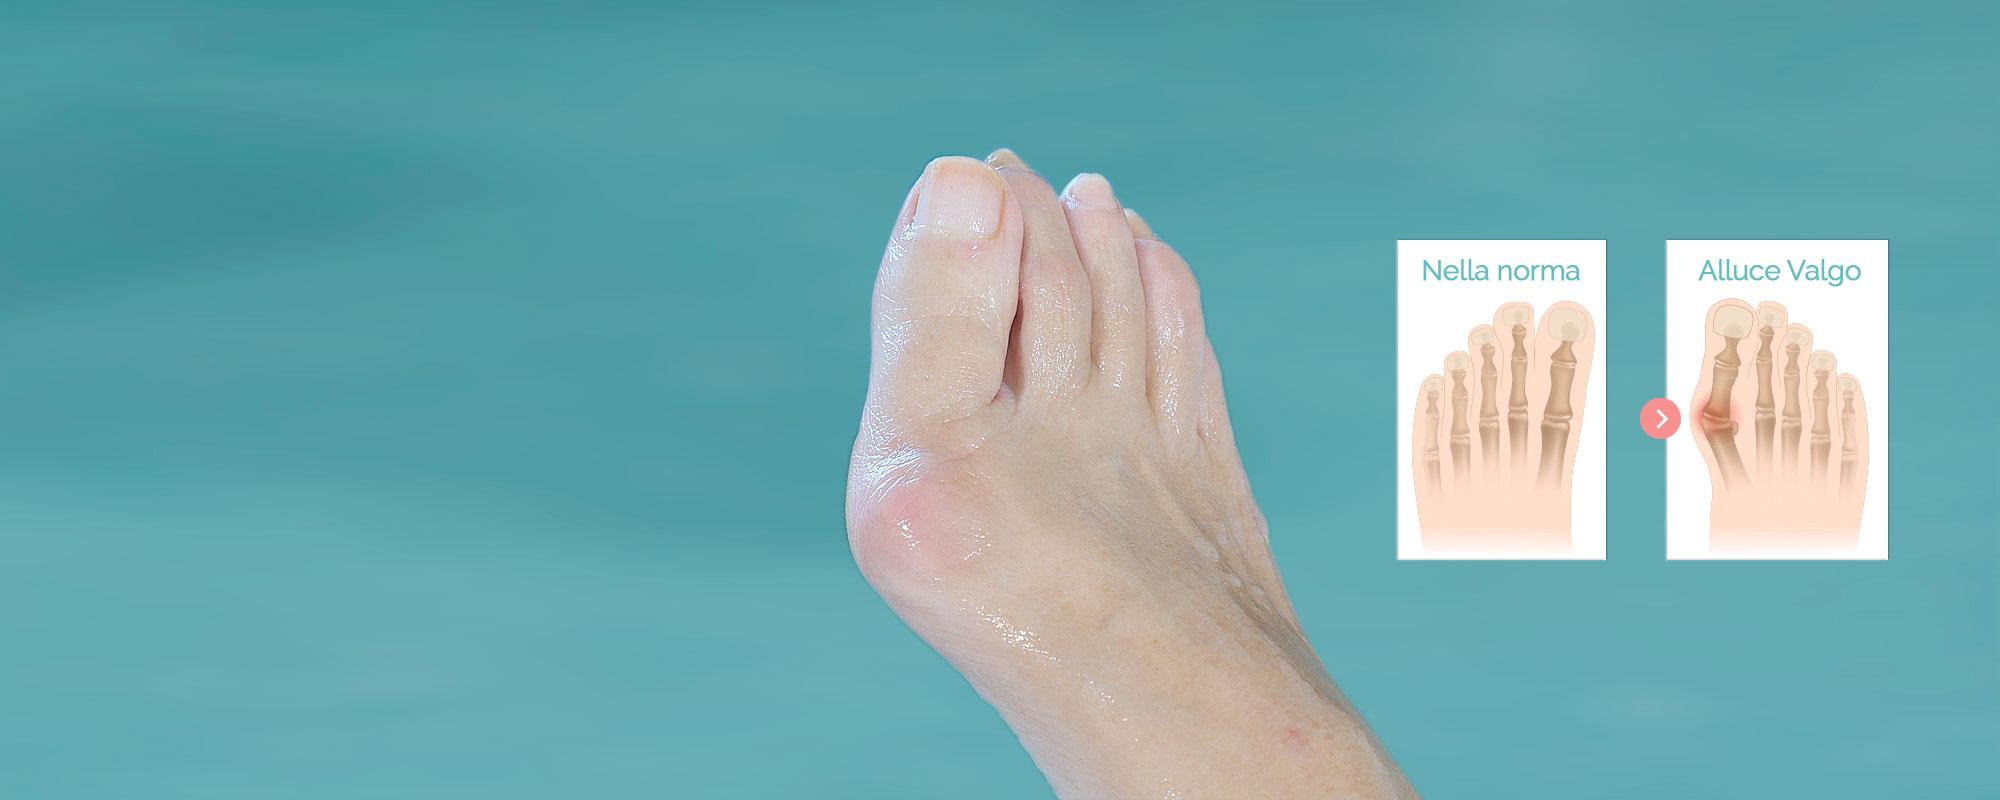 <b>Вальгусная деформация большого пальца стопы</b>